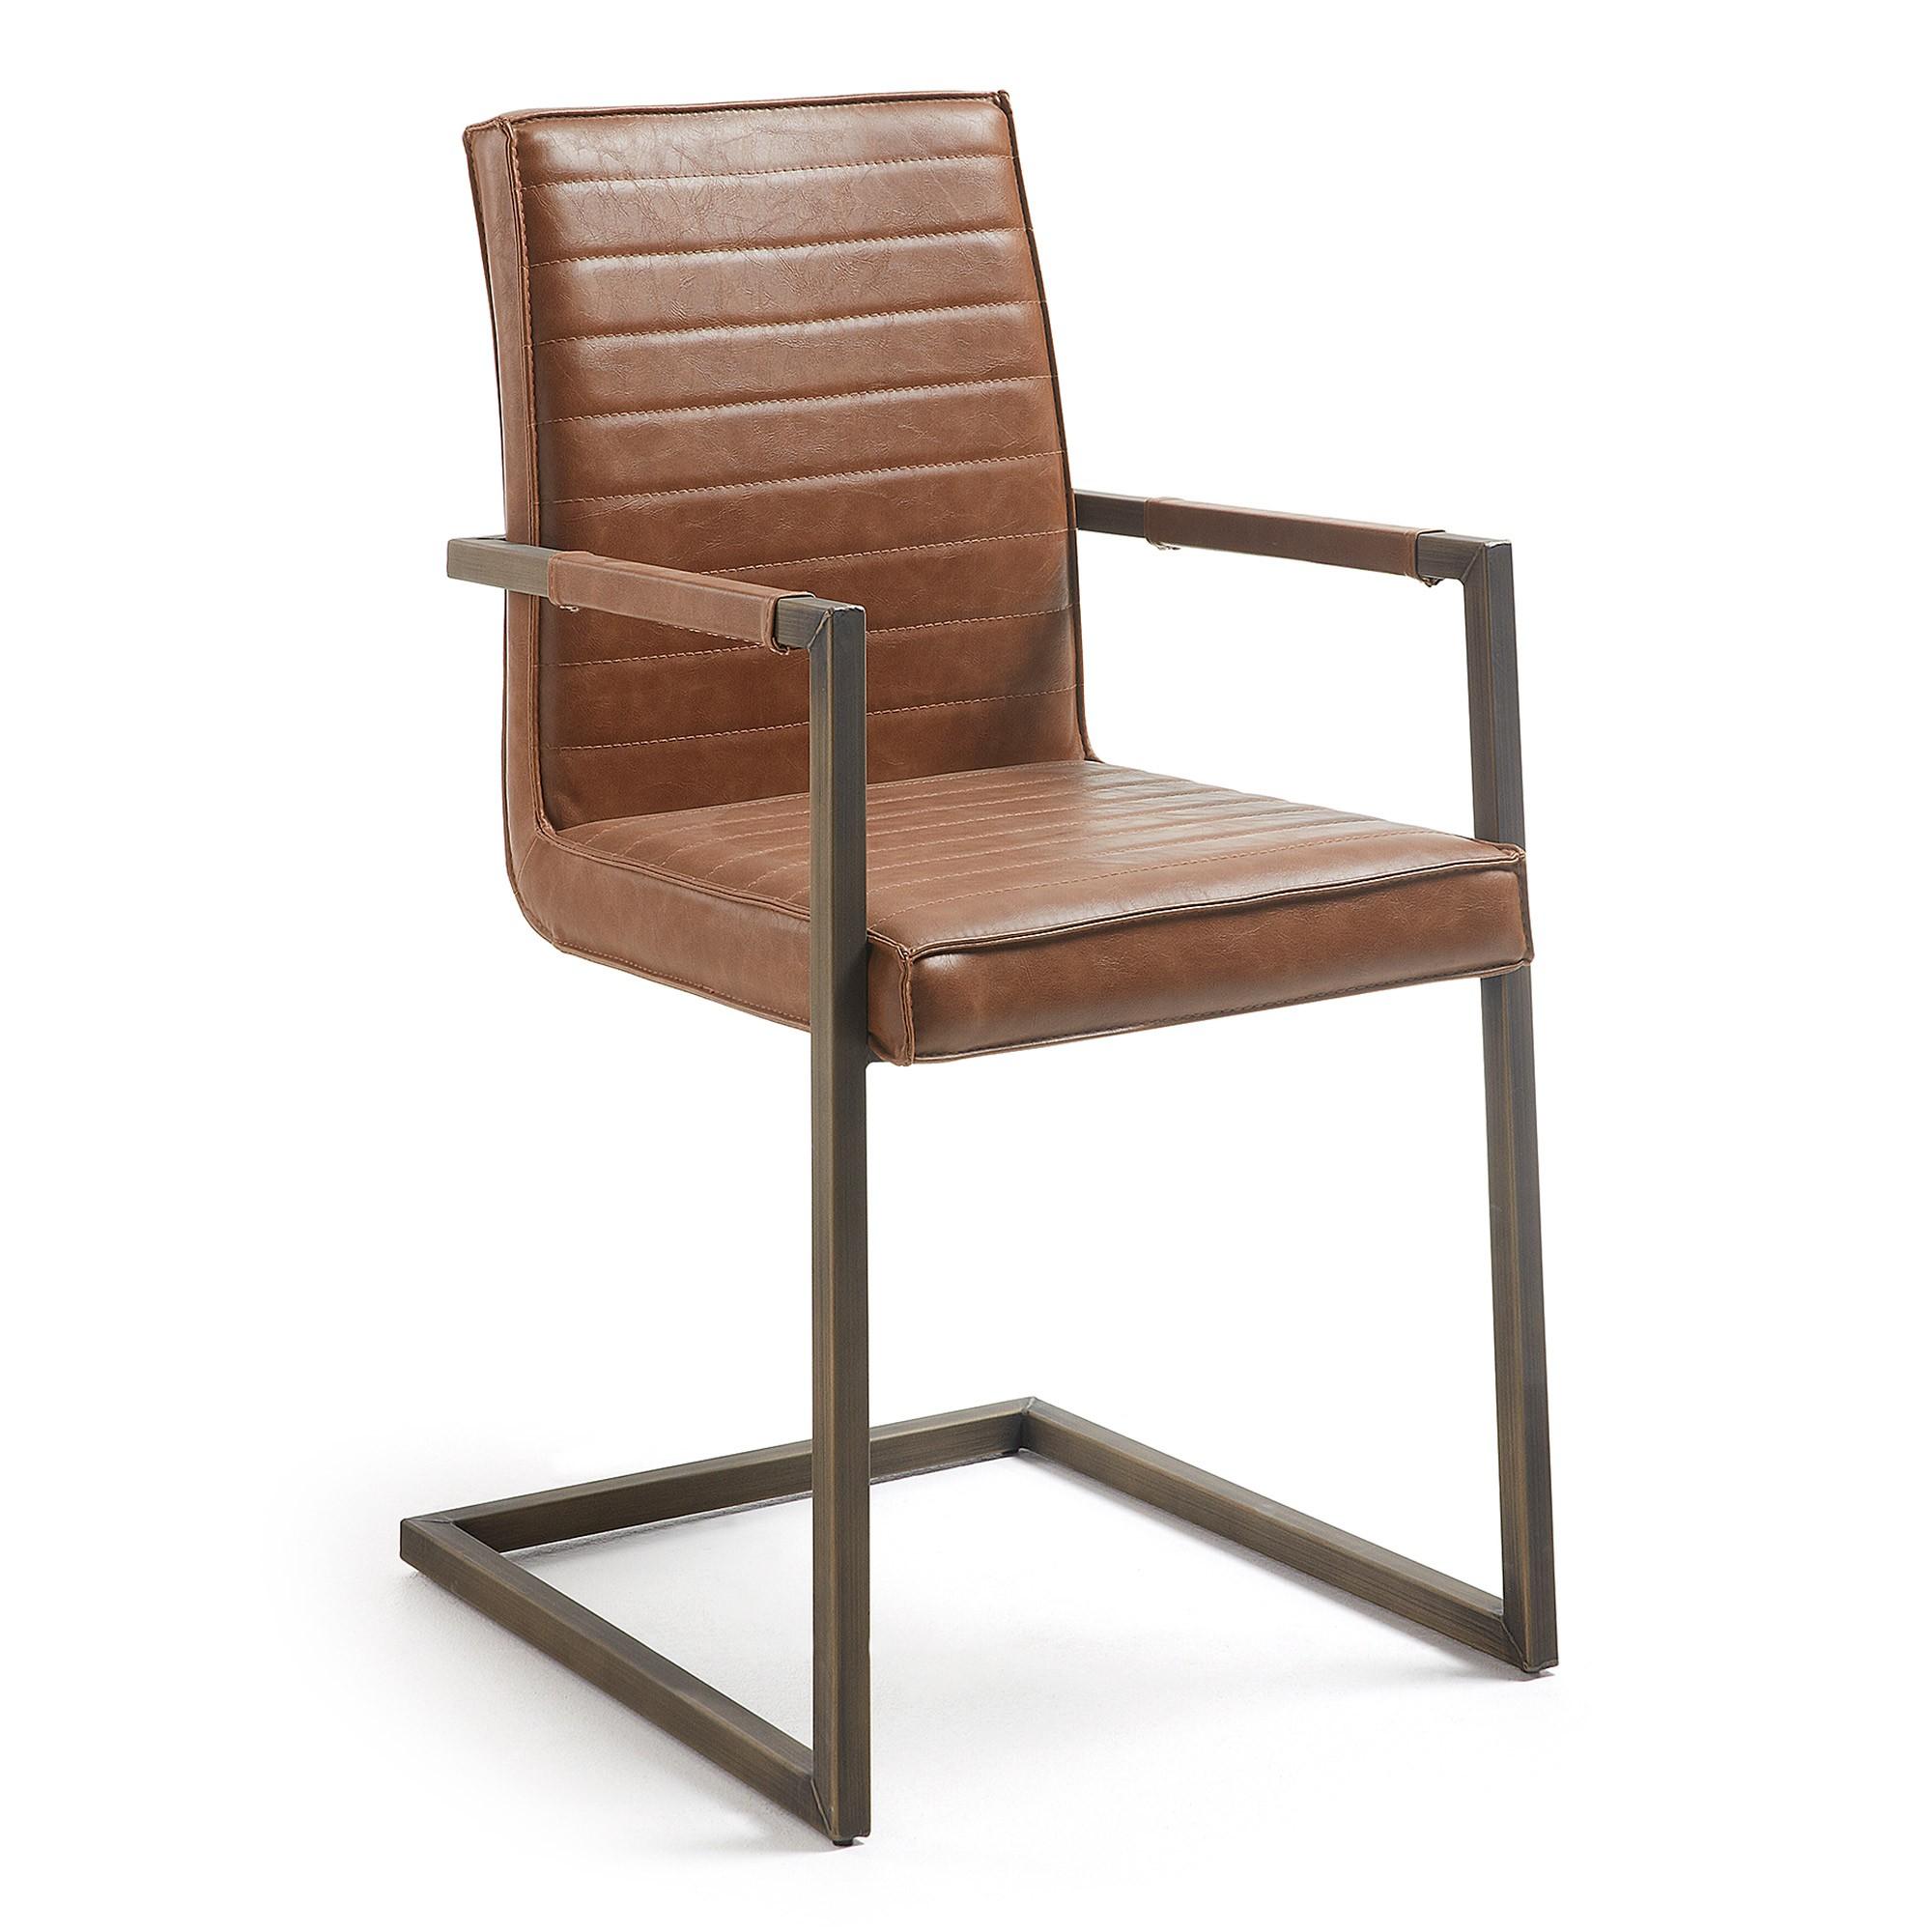 Tayten Faux Leather & Steel Dining Armchair, Tan